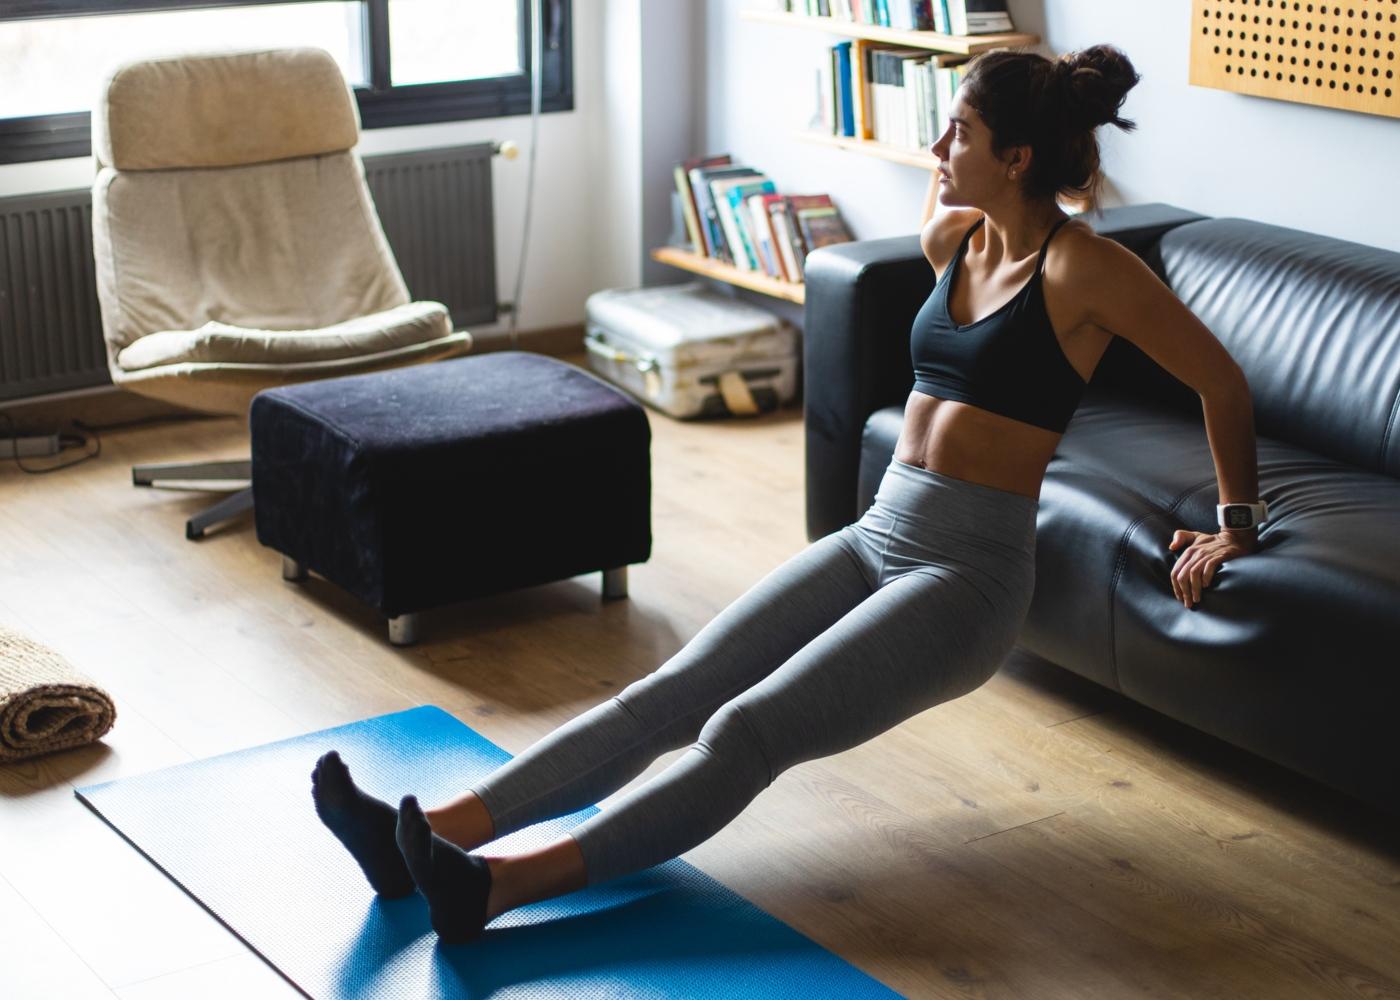 Fortalecer os braços em casa: mulher a trabalhar triceps